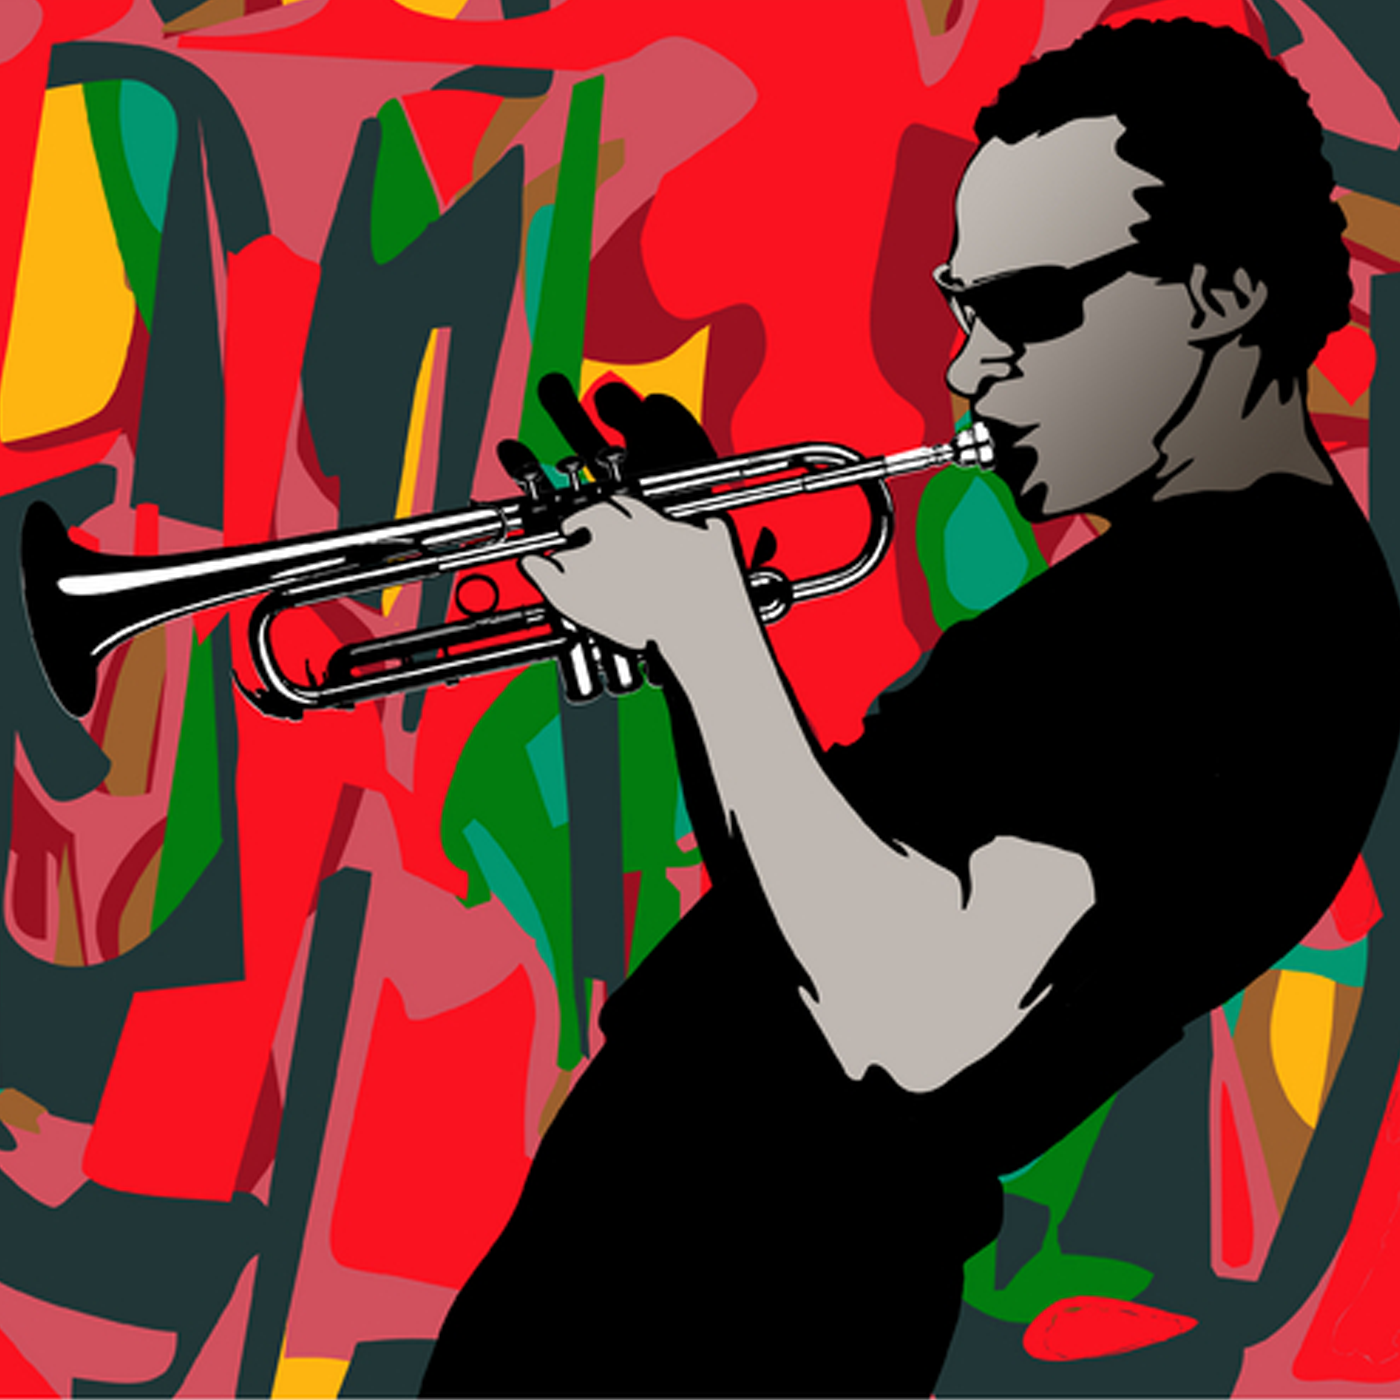 JAZZRADIO com - enjoy great jazz music